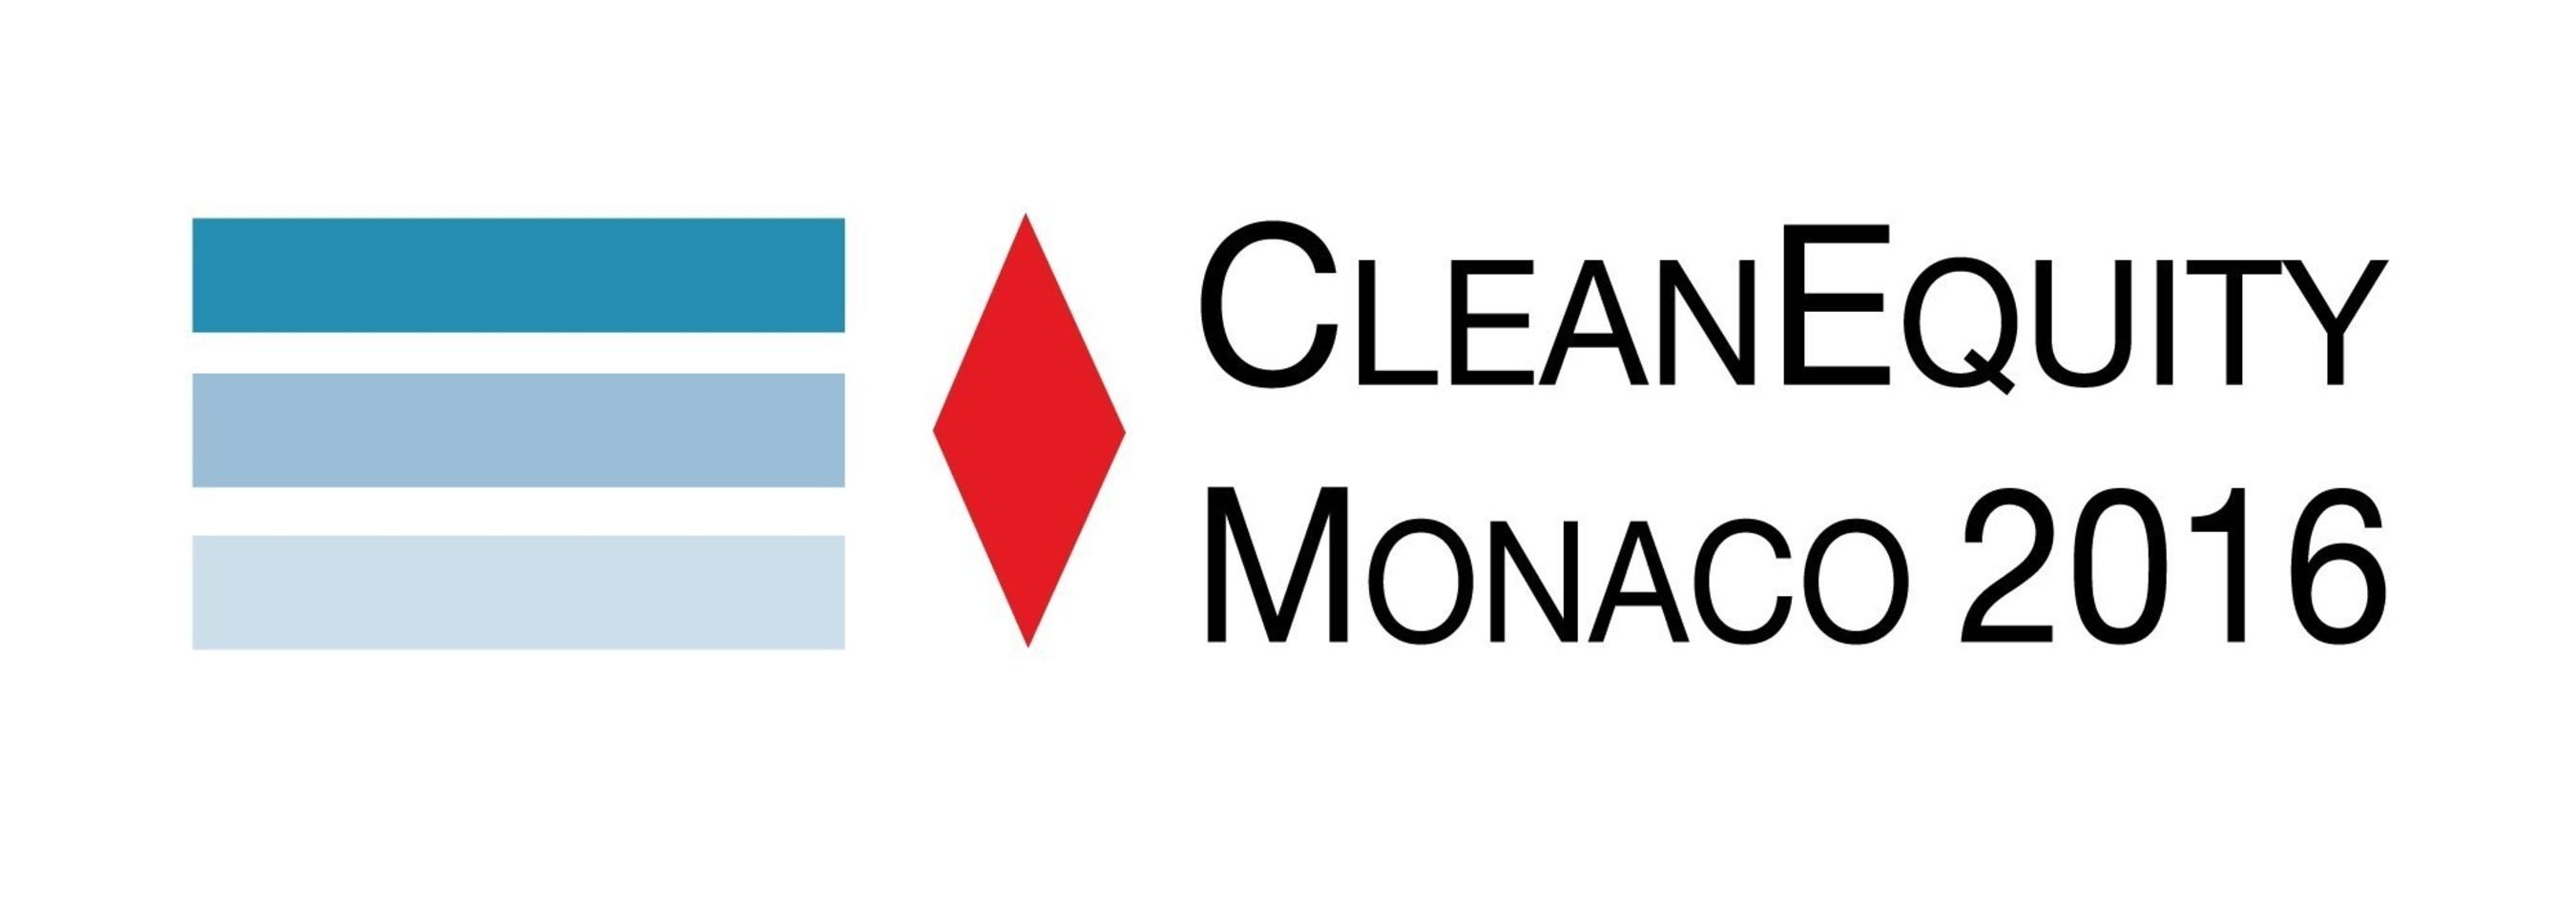 CleanEquity Monaco 2016 (PRNewsFoto/Innovator Capital)